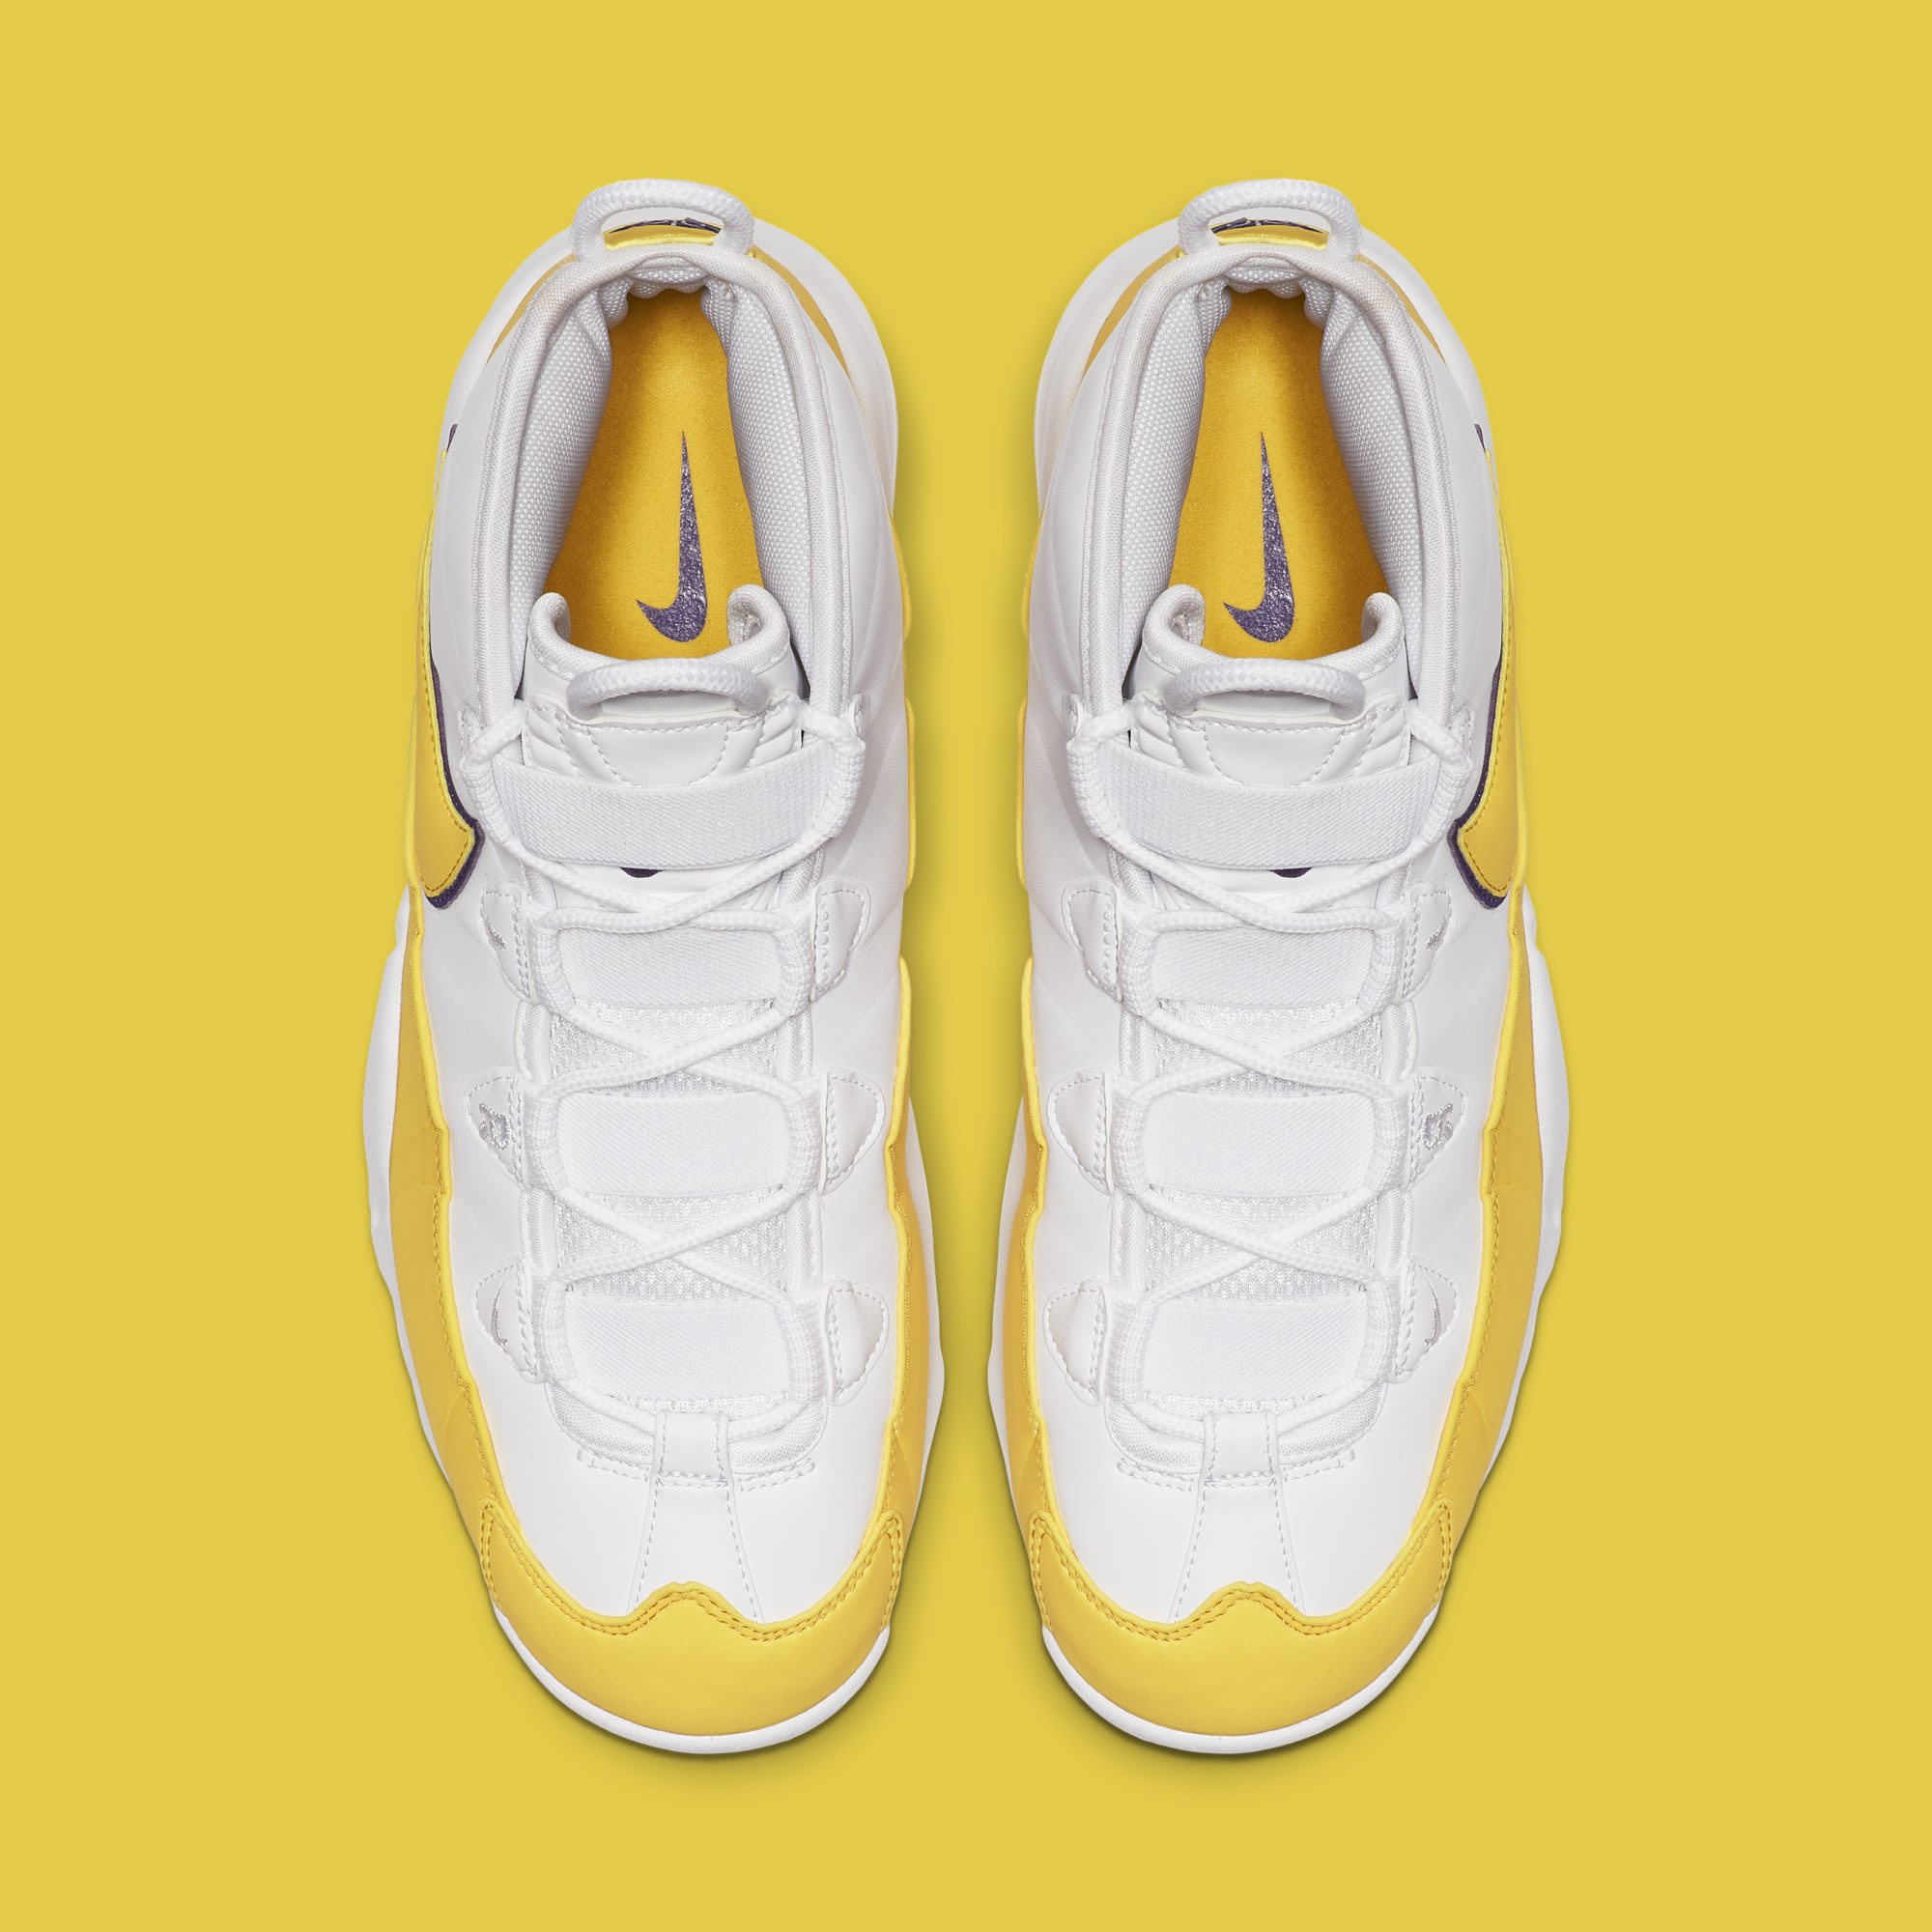 Nike Air Max Uptempo 'Derek Fisher PE' CK0892-102 (Top)